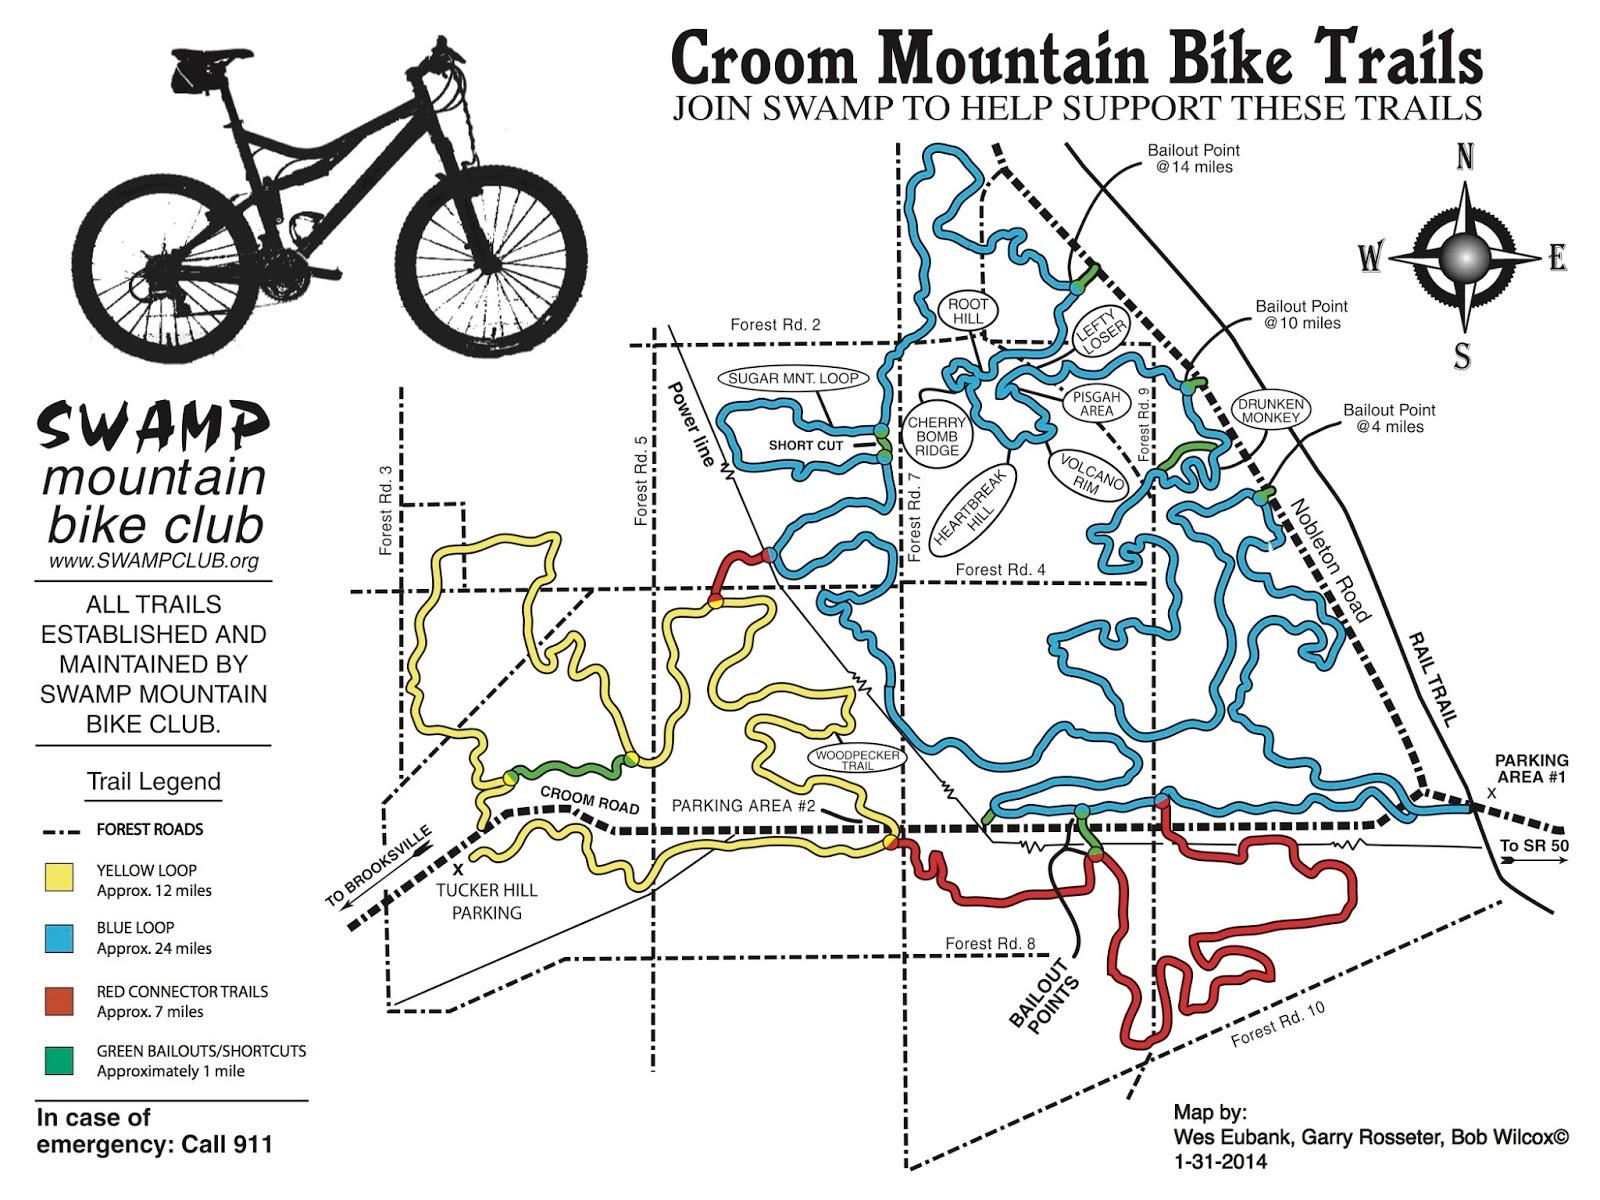 Chuck's Adventures: Biking Florida's Croom Mountain Biking Trails - Florida Mountain Bike Trails Map